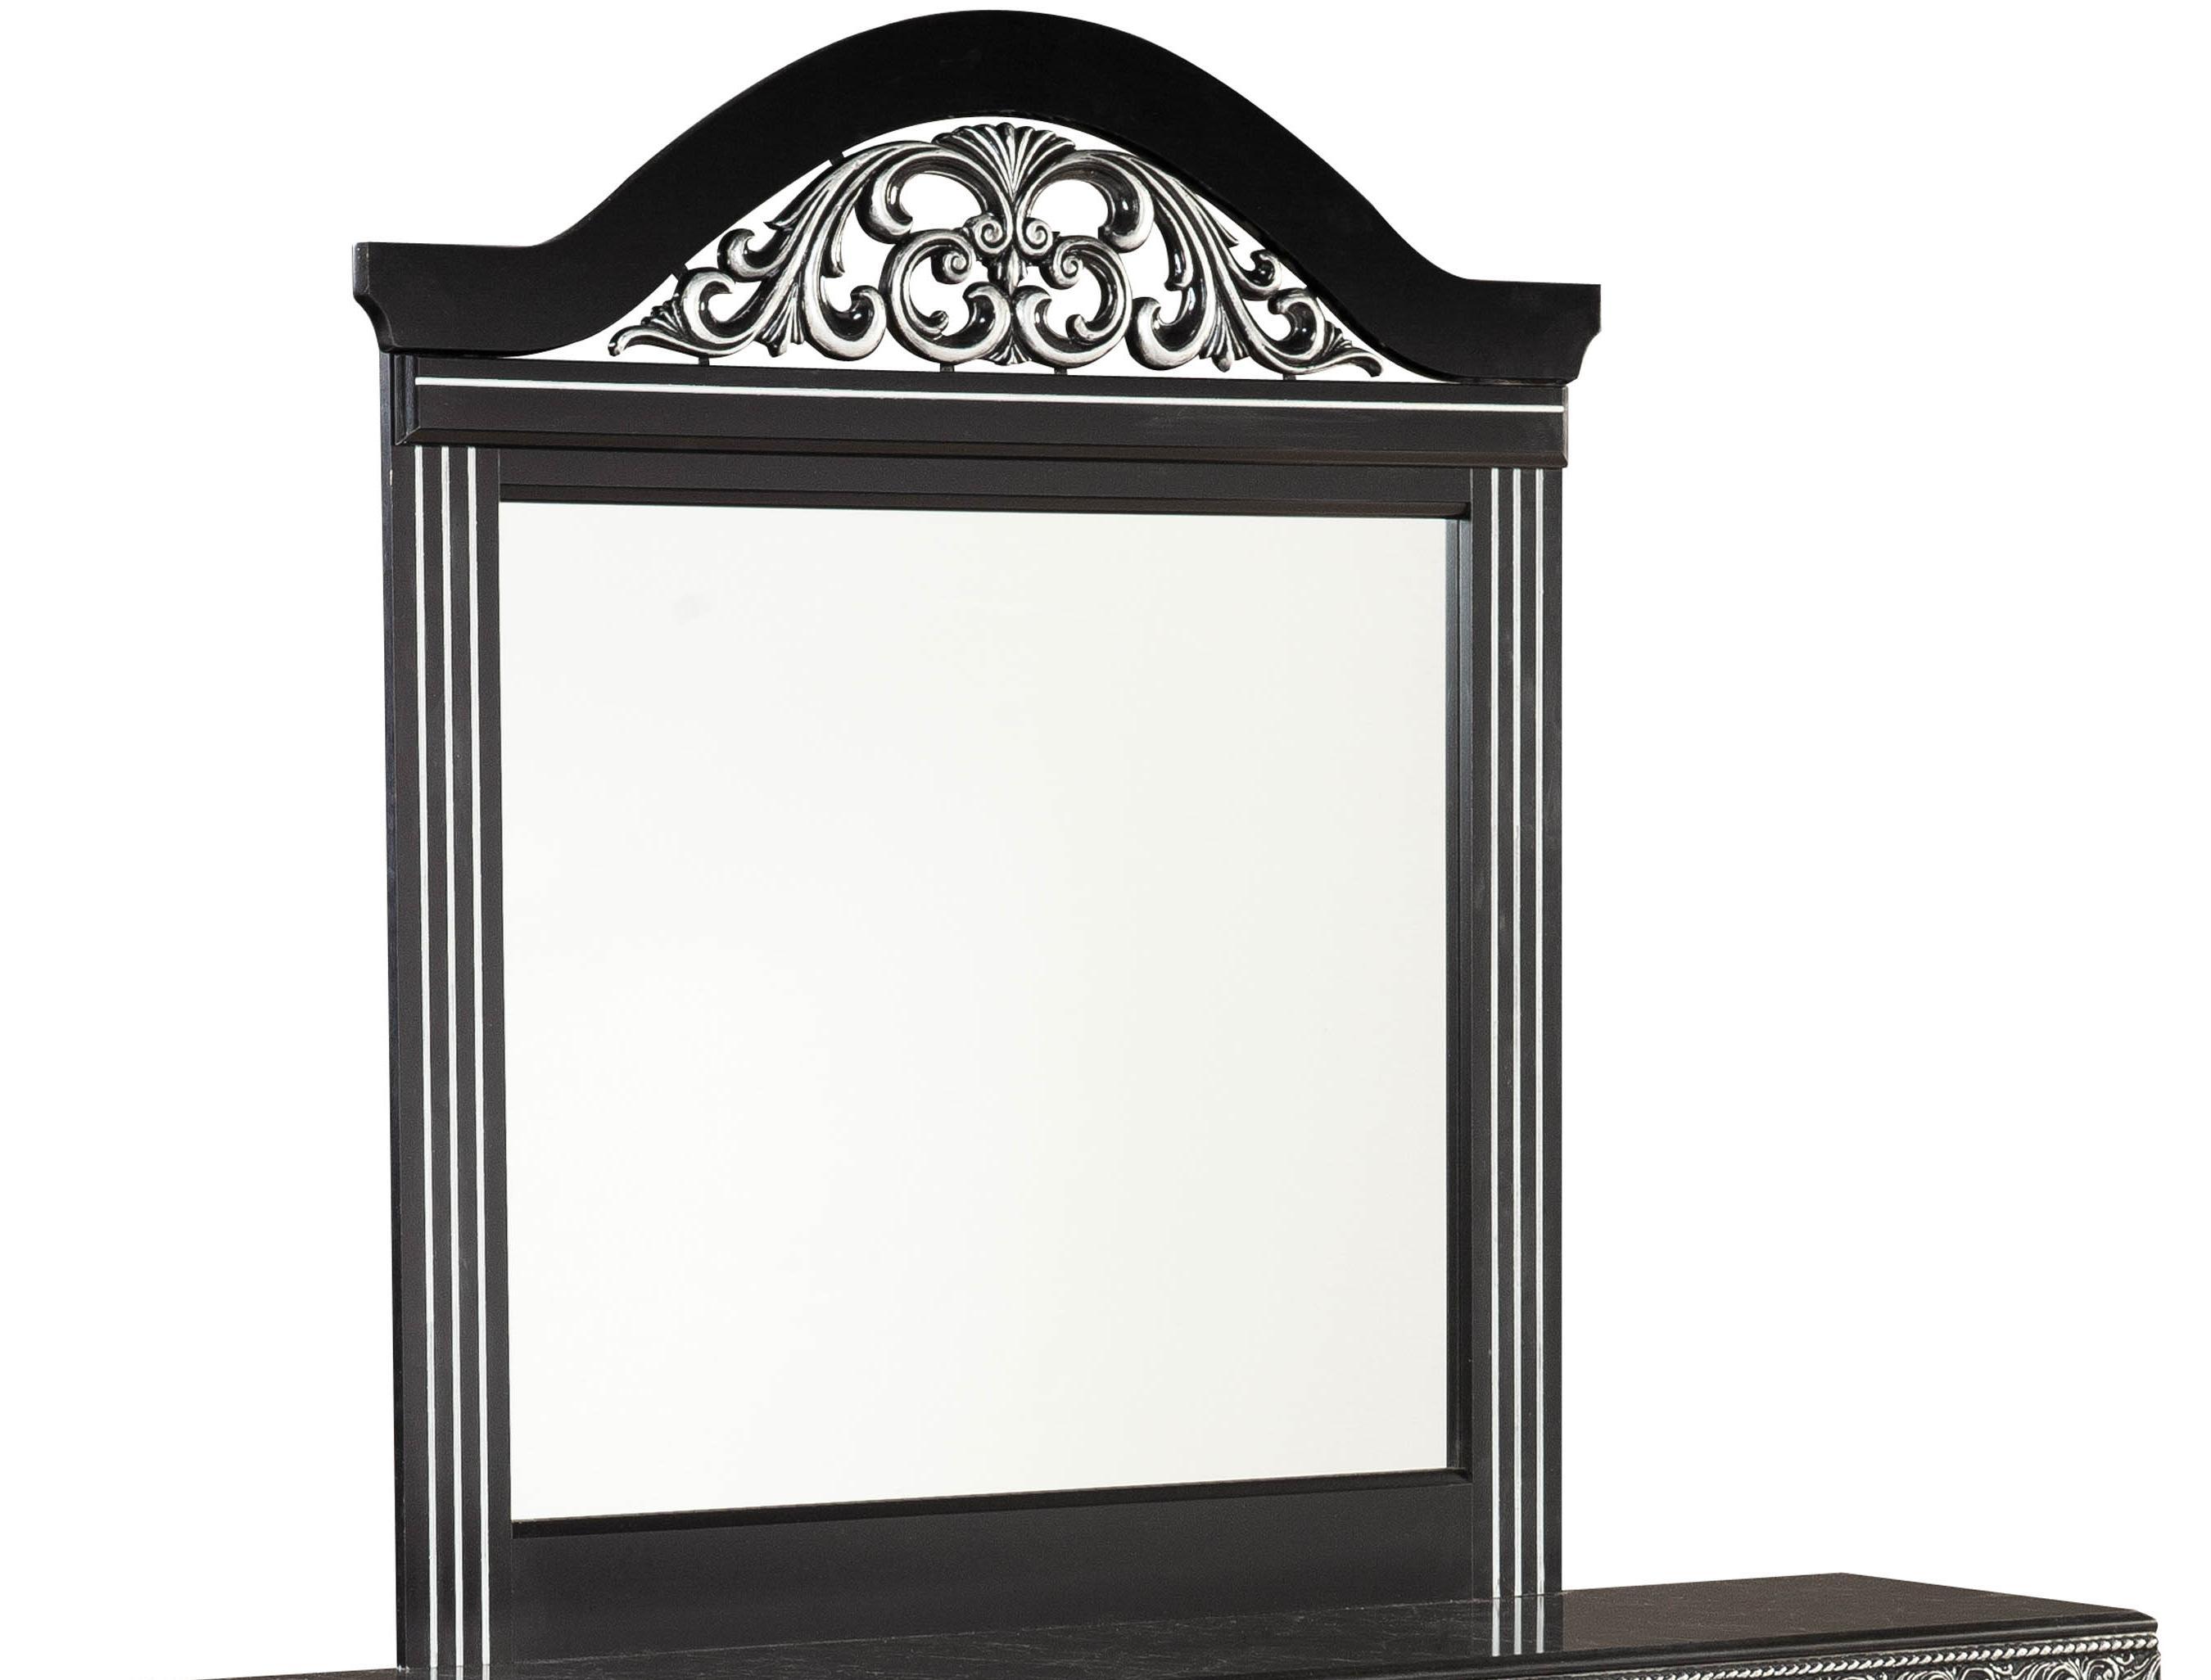 Standard Furniture Odessa Mirror - Item Number: 69568